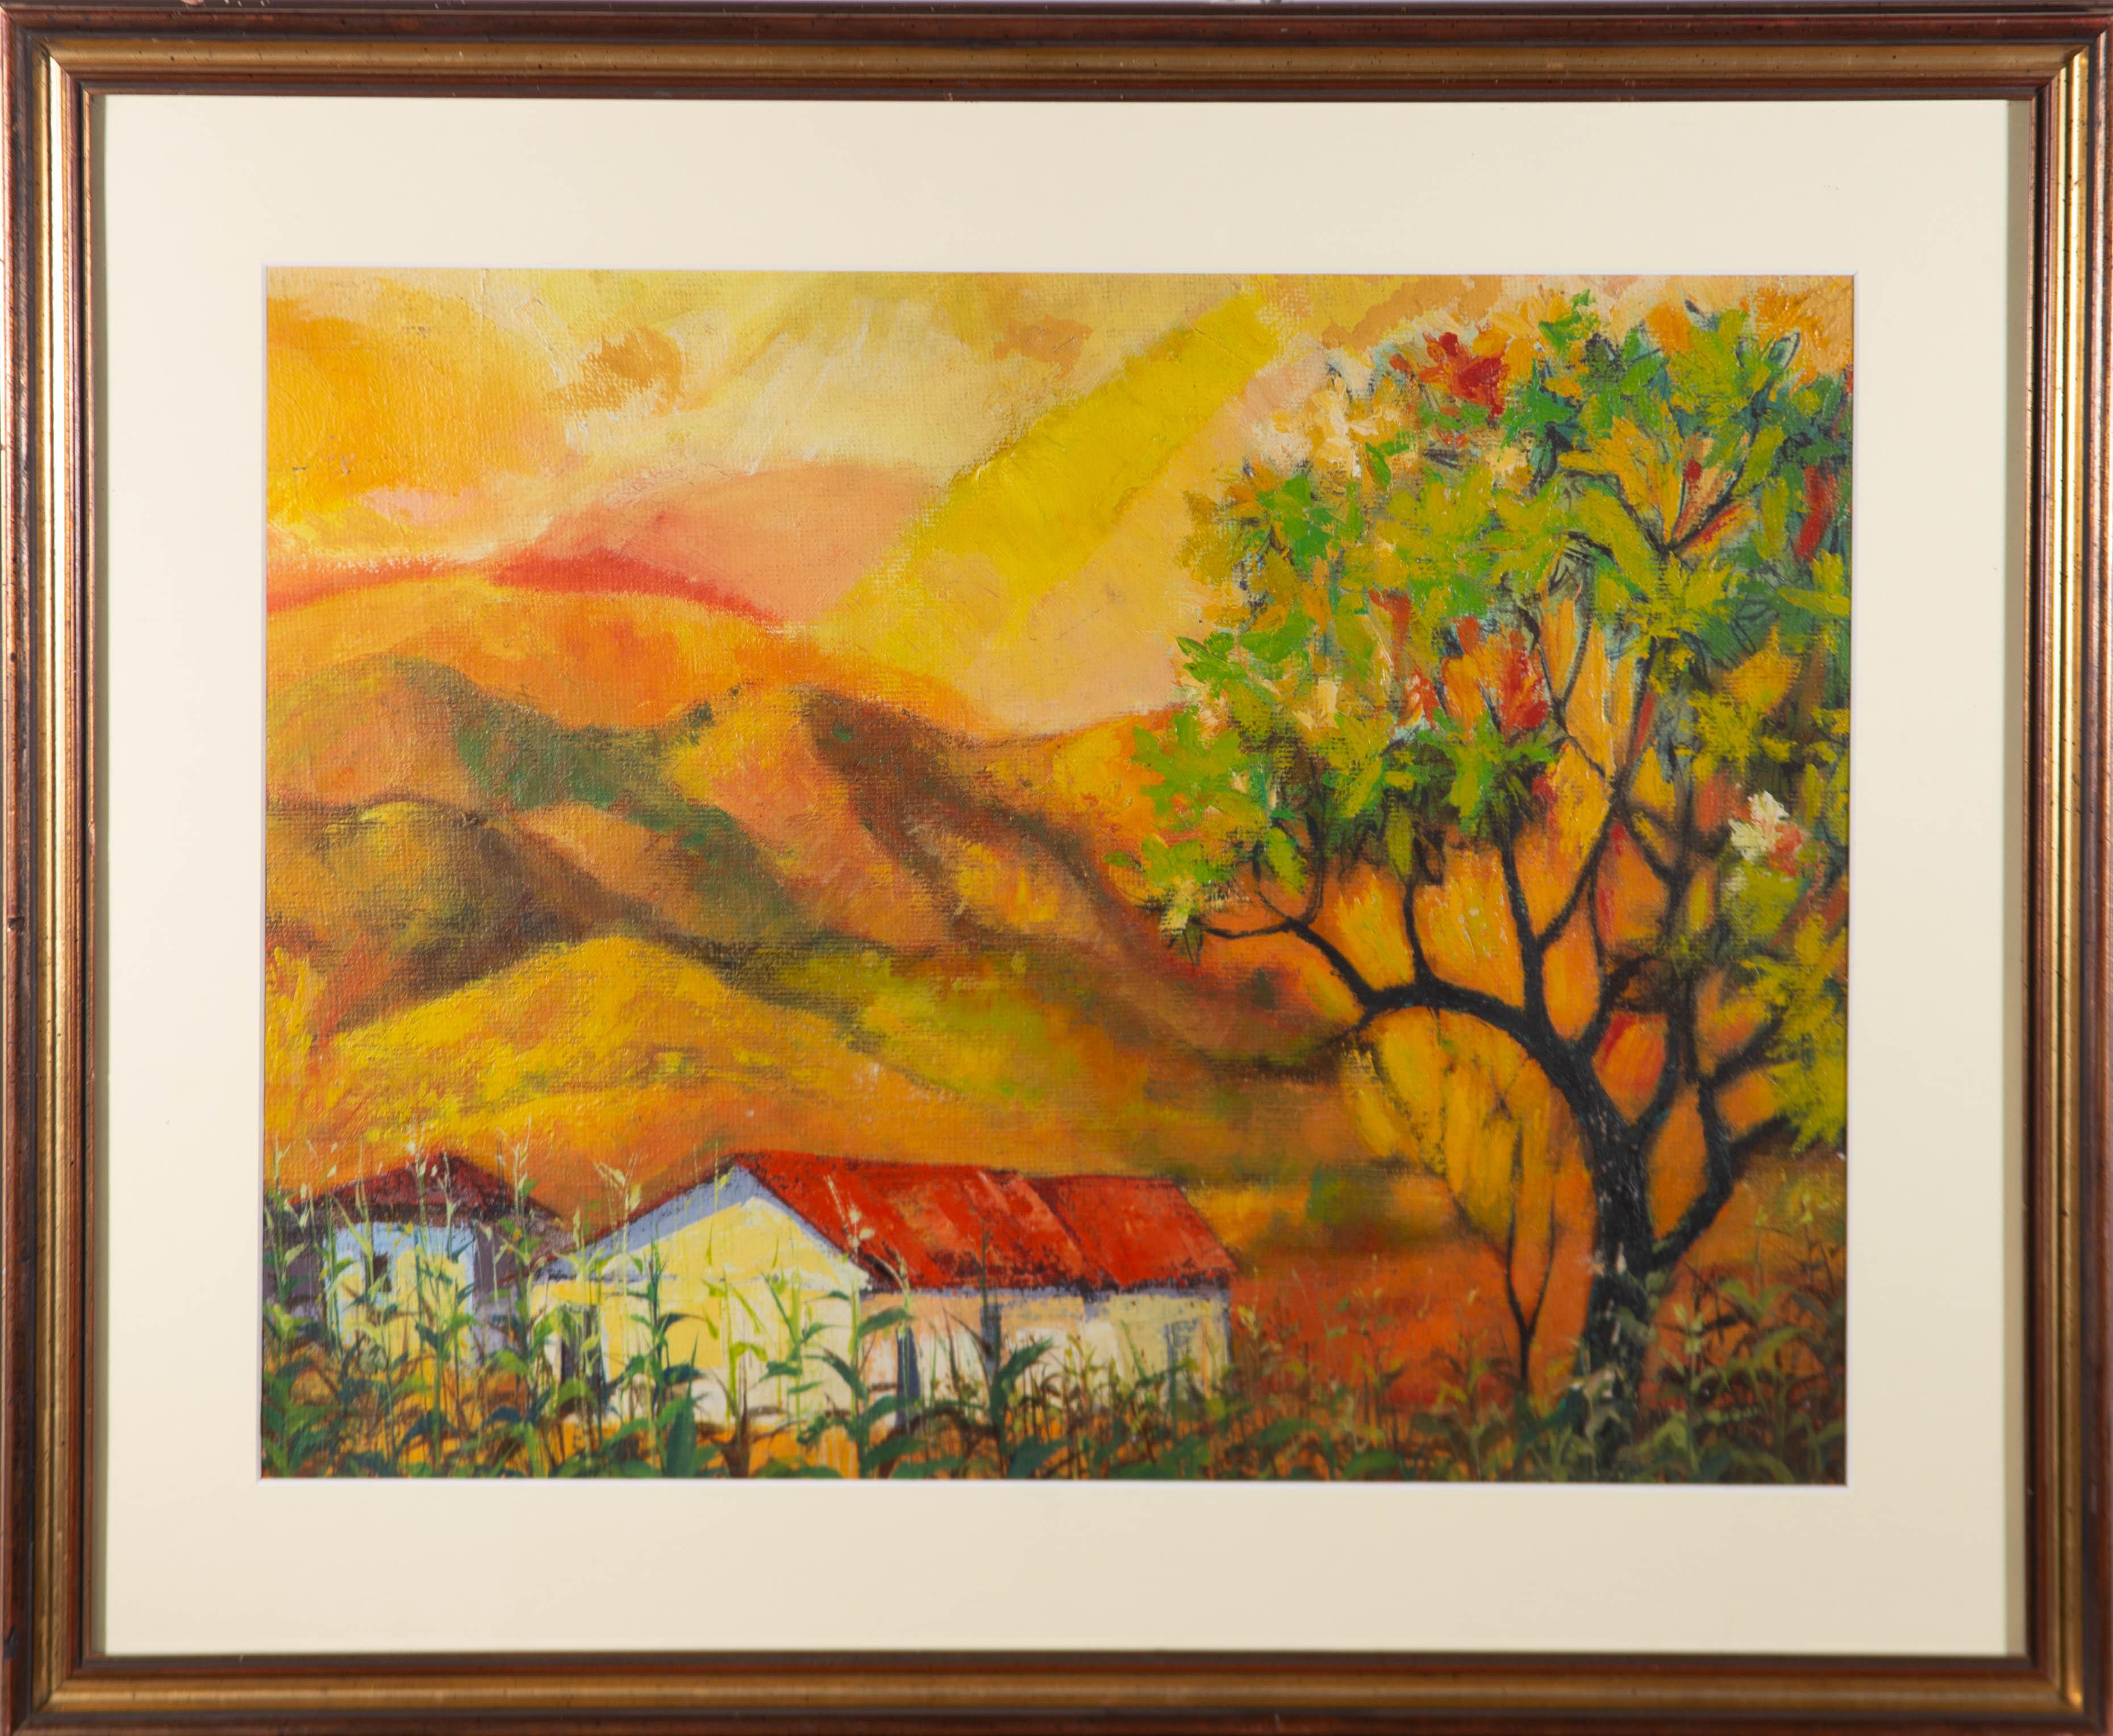 Ken Abendana Spencer (1929-2005) - Framed 20th Century Acrylic, Jamaican Sunset